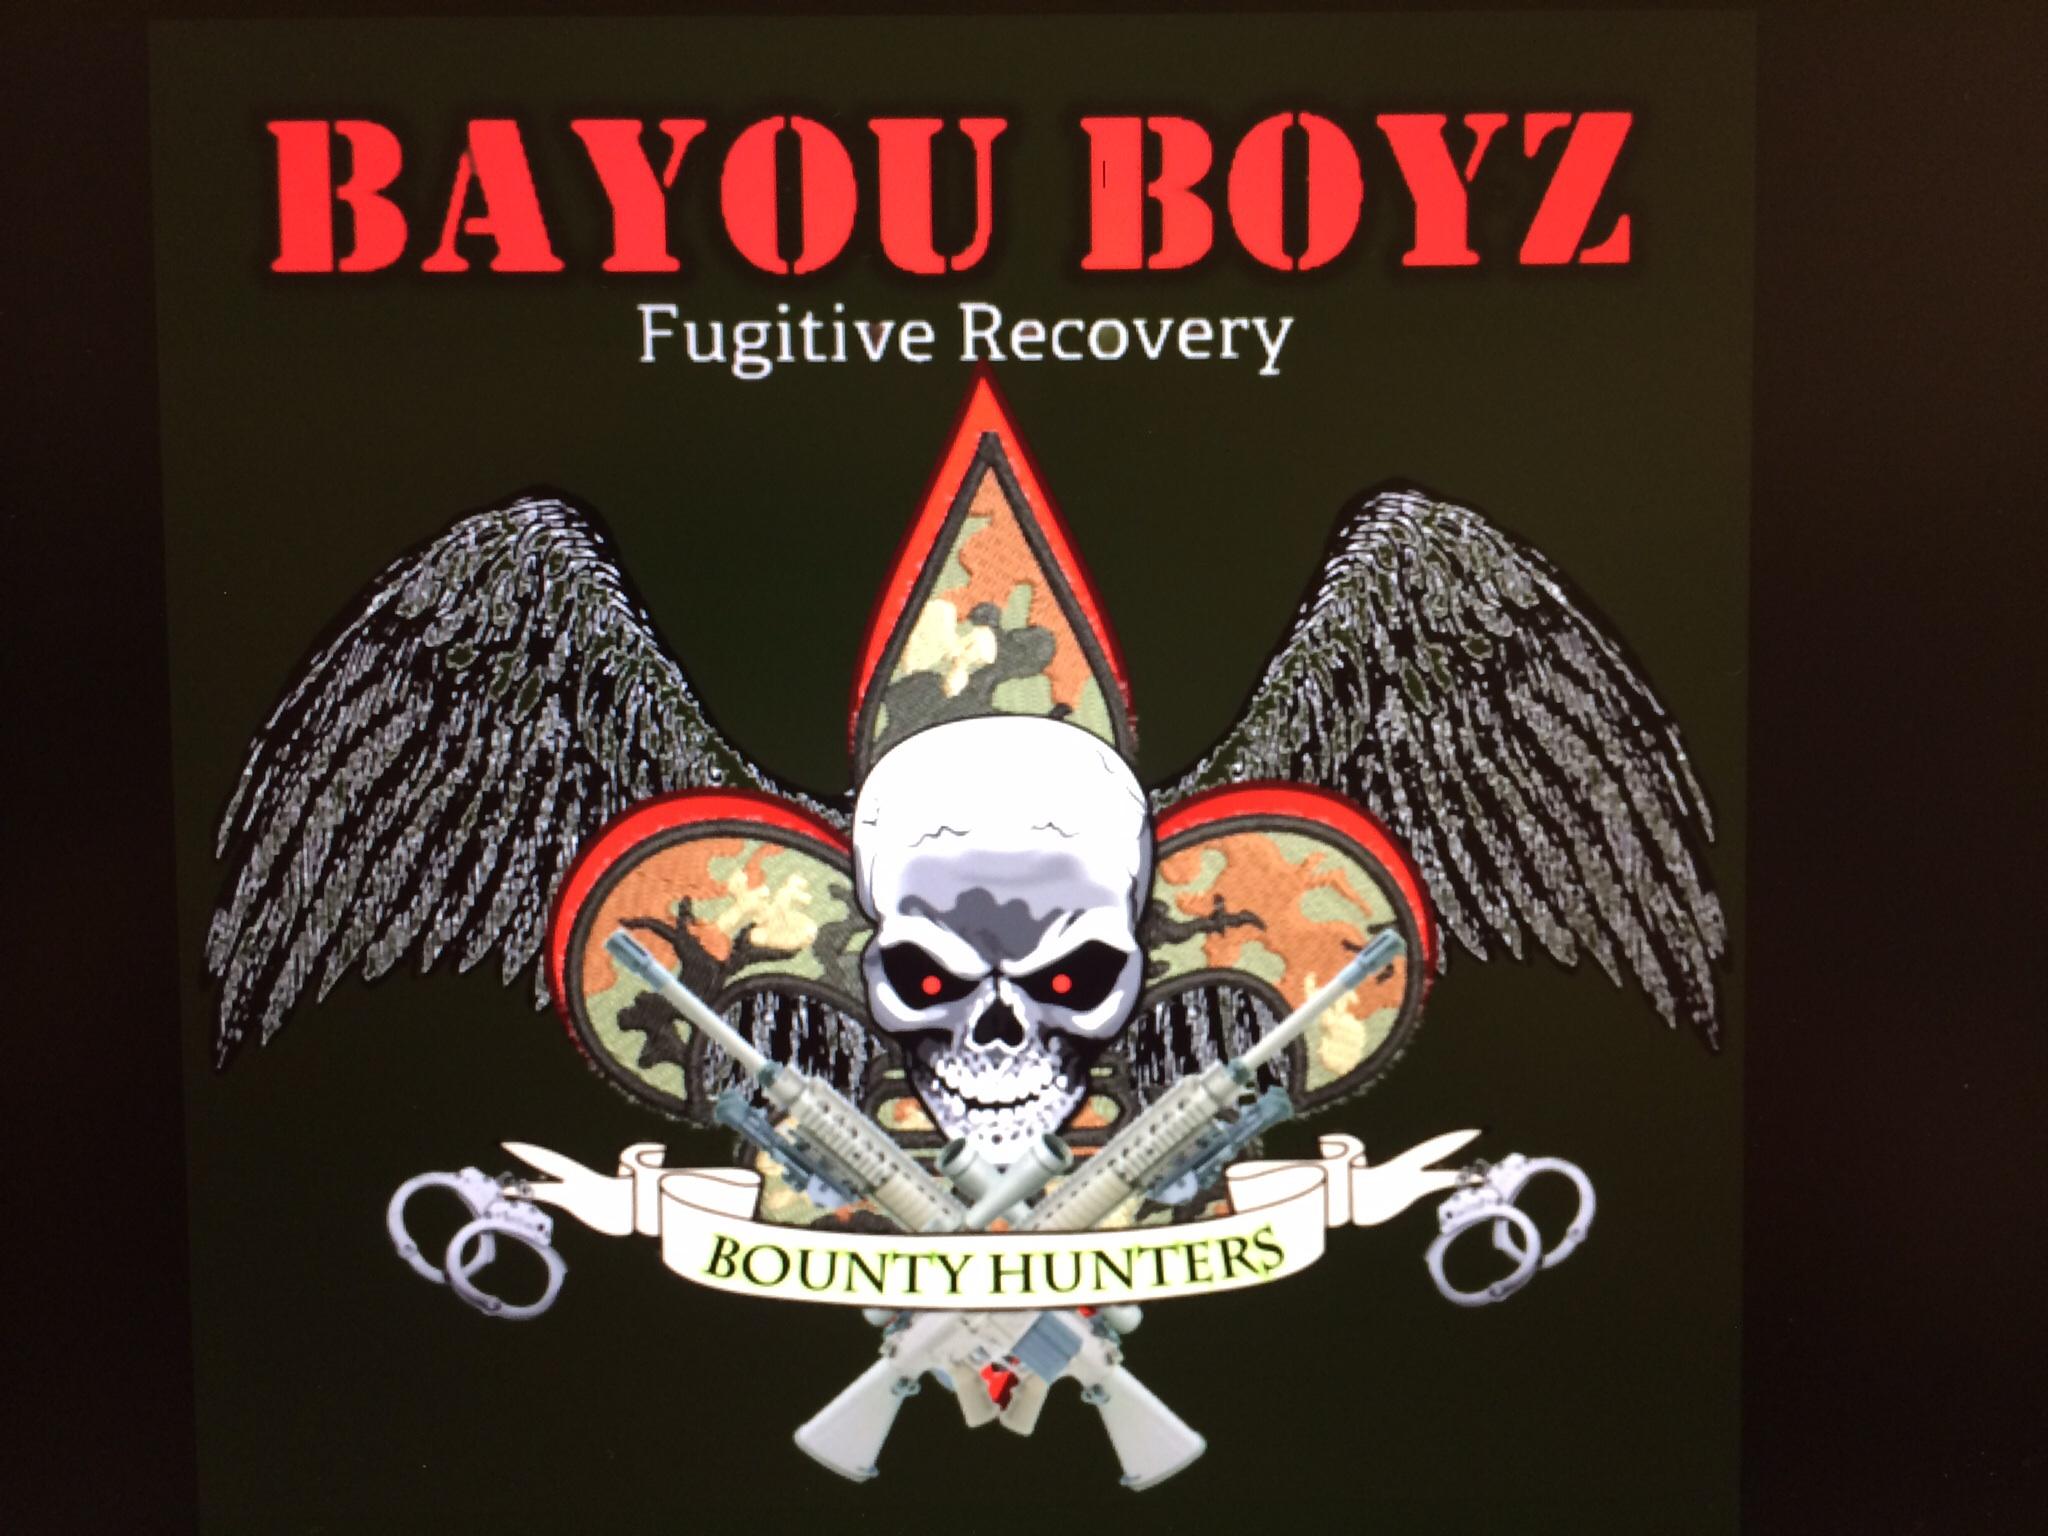 Bayou Boyz Fugitive Recovery Logo